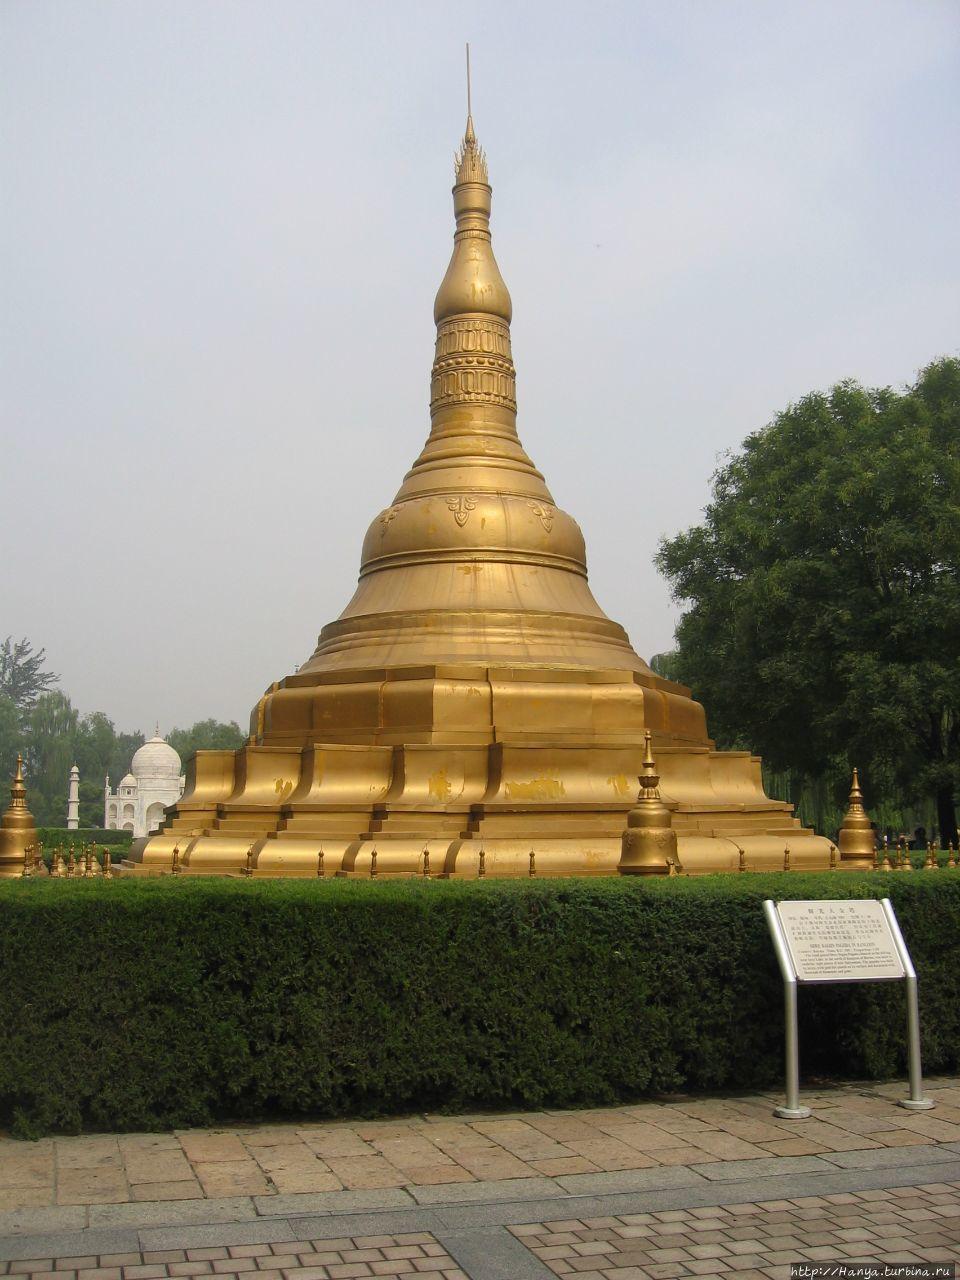 Пекин. Парк Миниатюр.Мьян